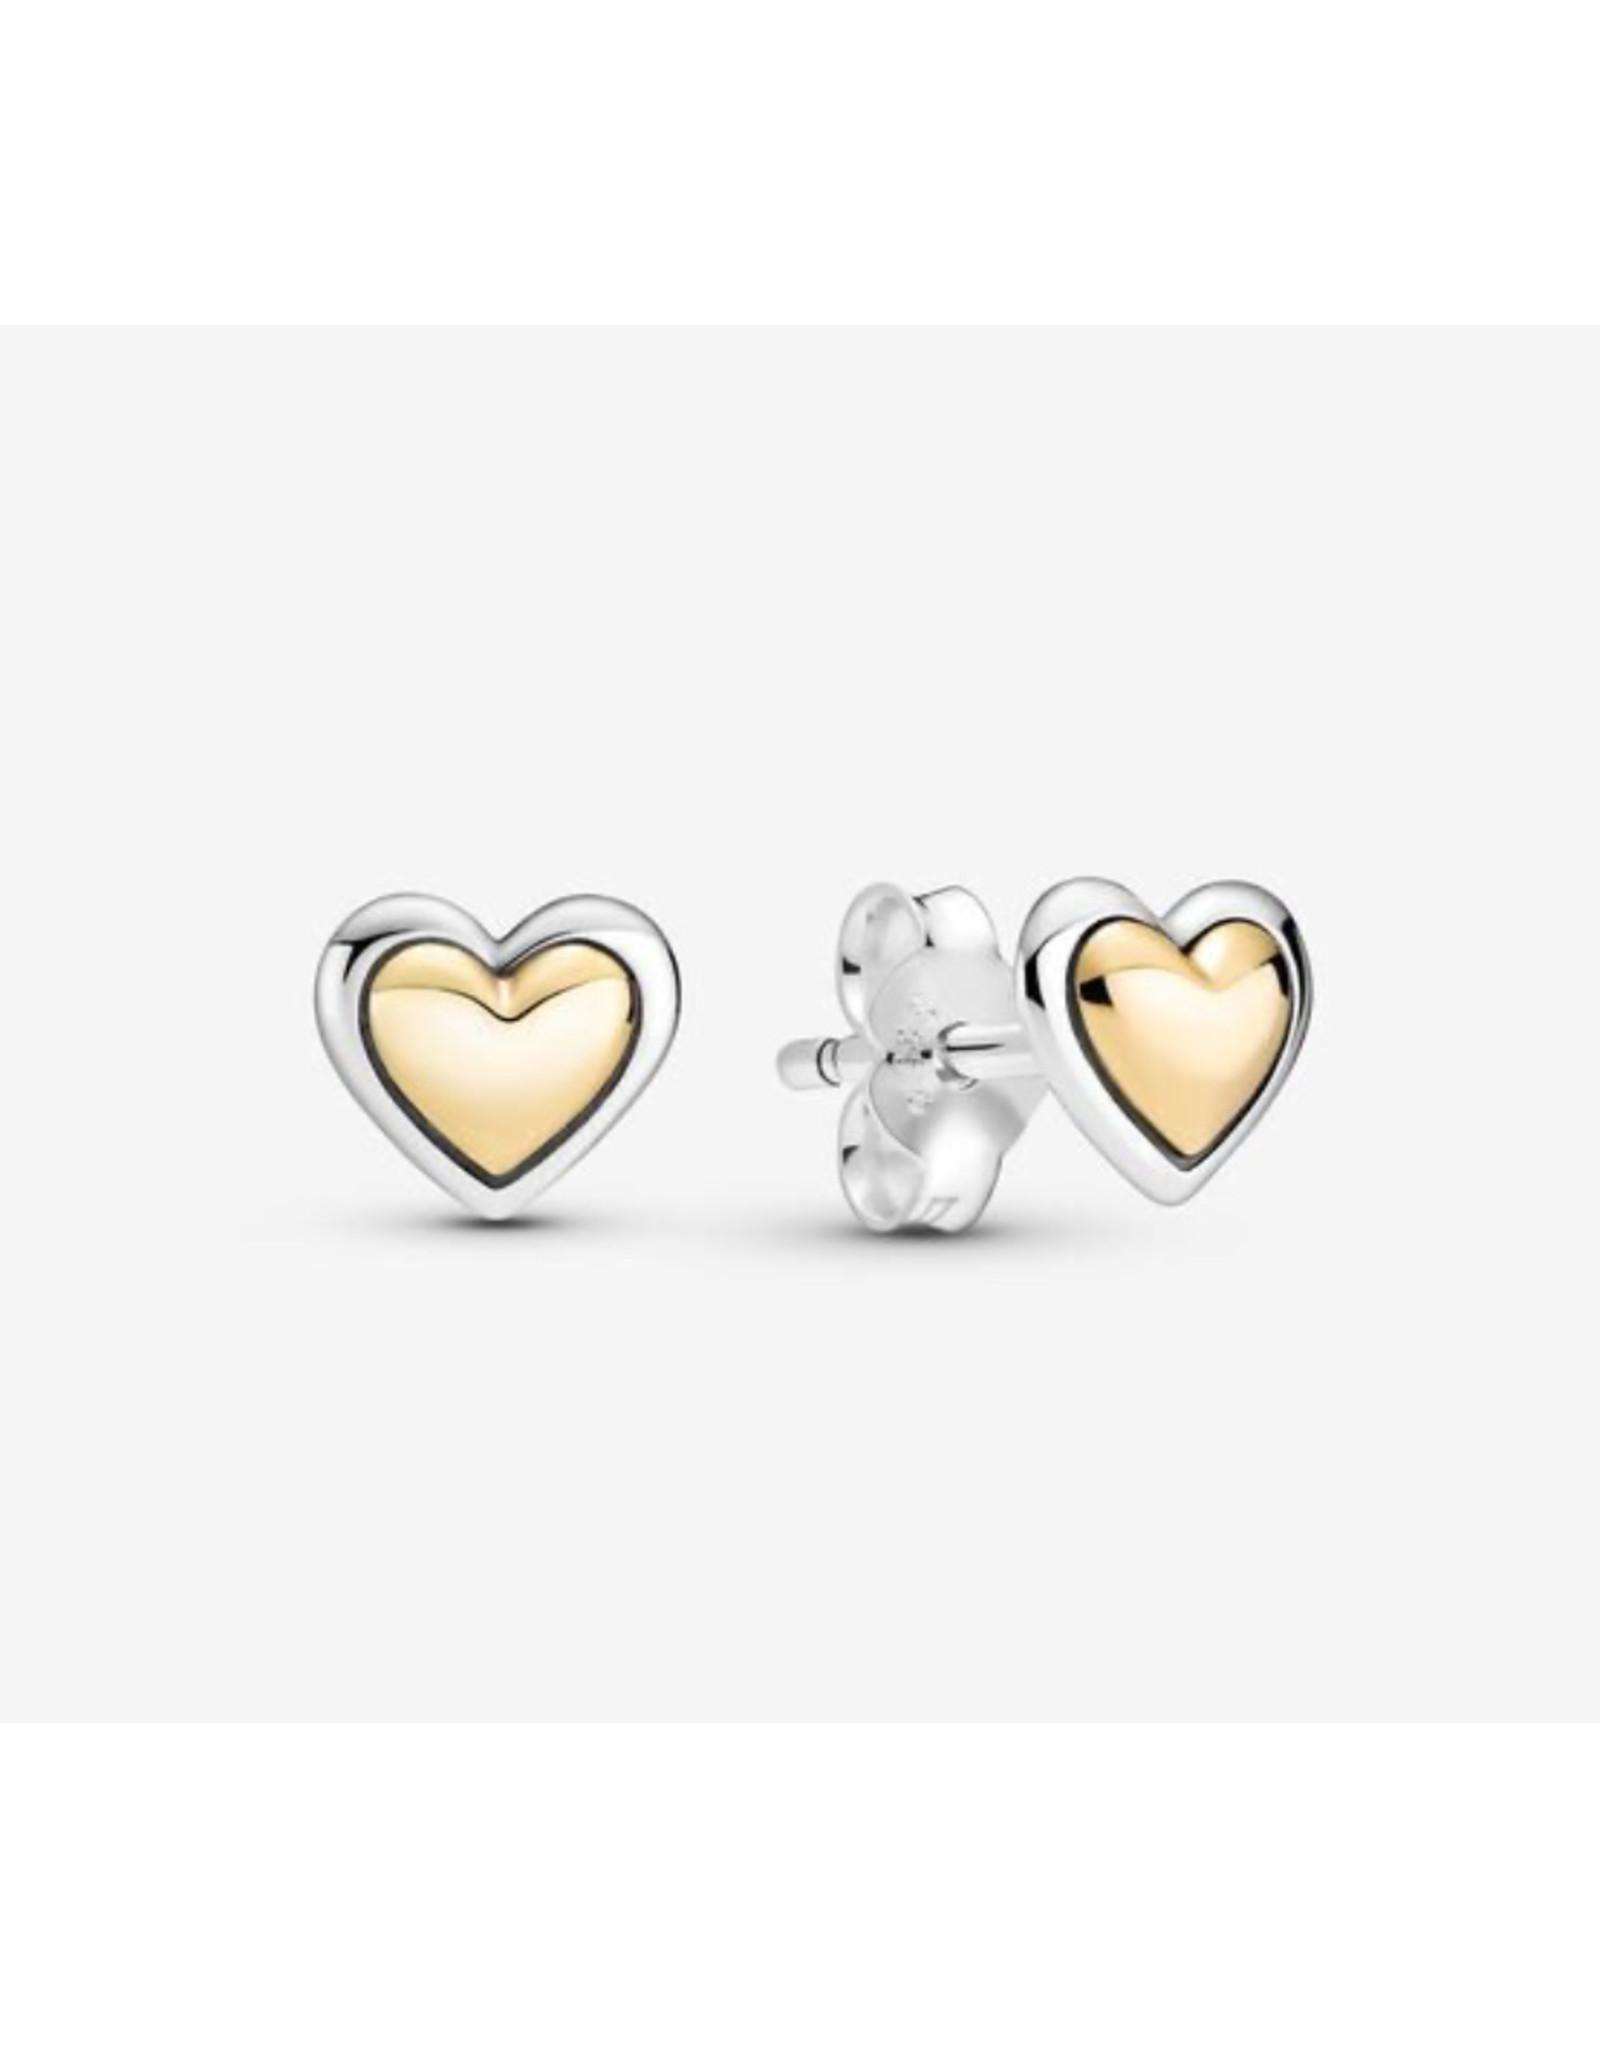 Pandora Pandora Earrings,299389C00, Domed Golden Stud, With 14K Gold